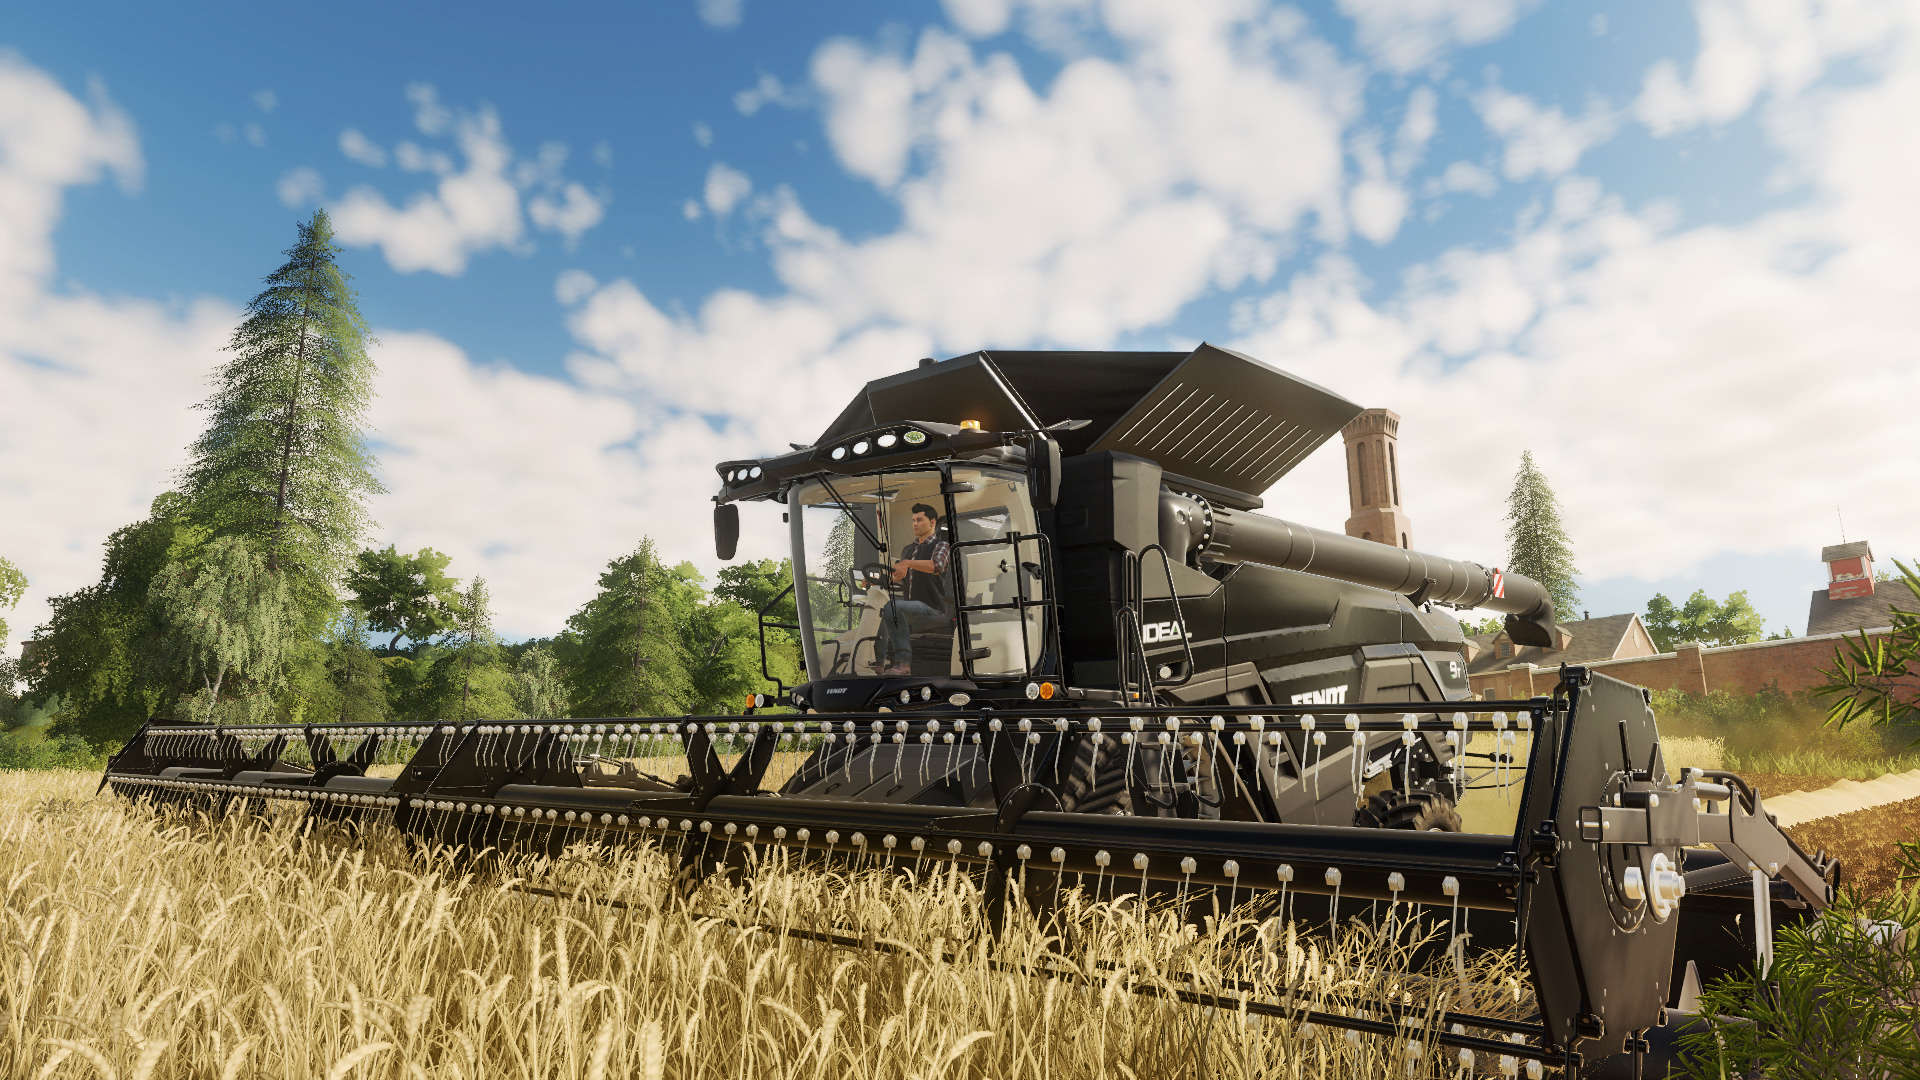 Pre-Order Farming Simulator 19 on Steam